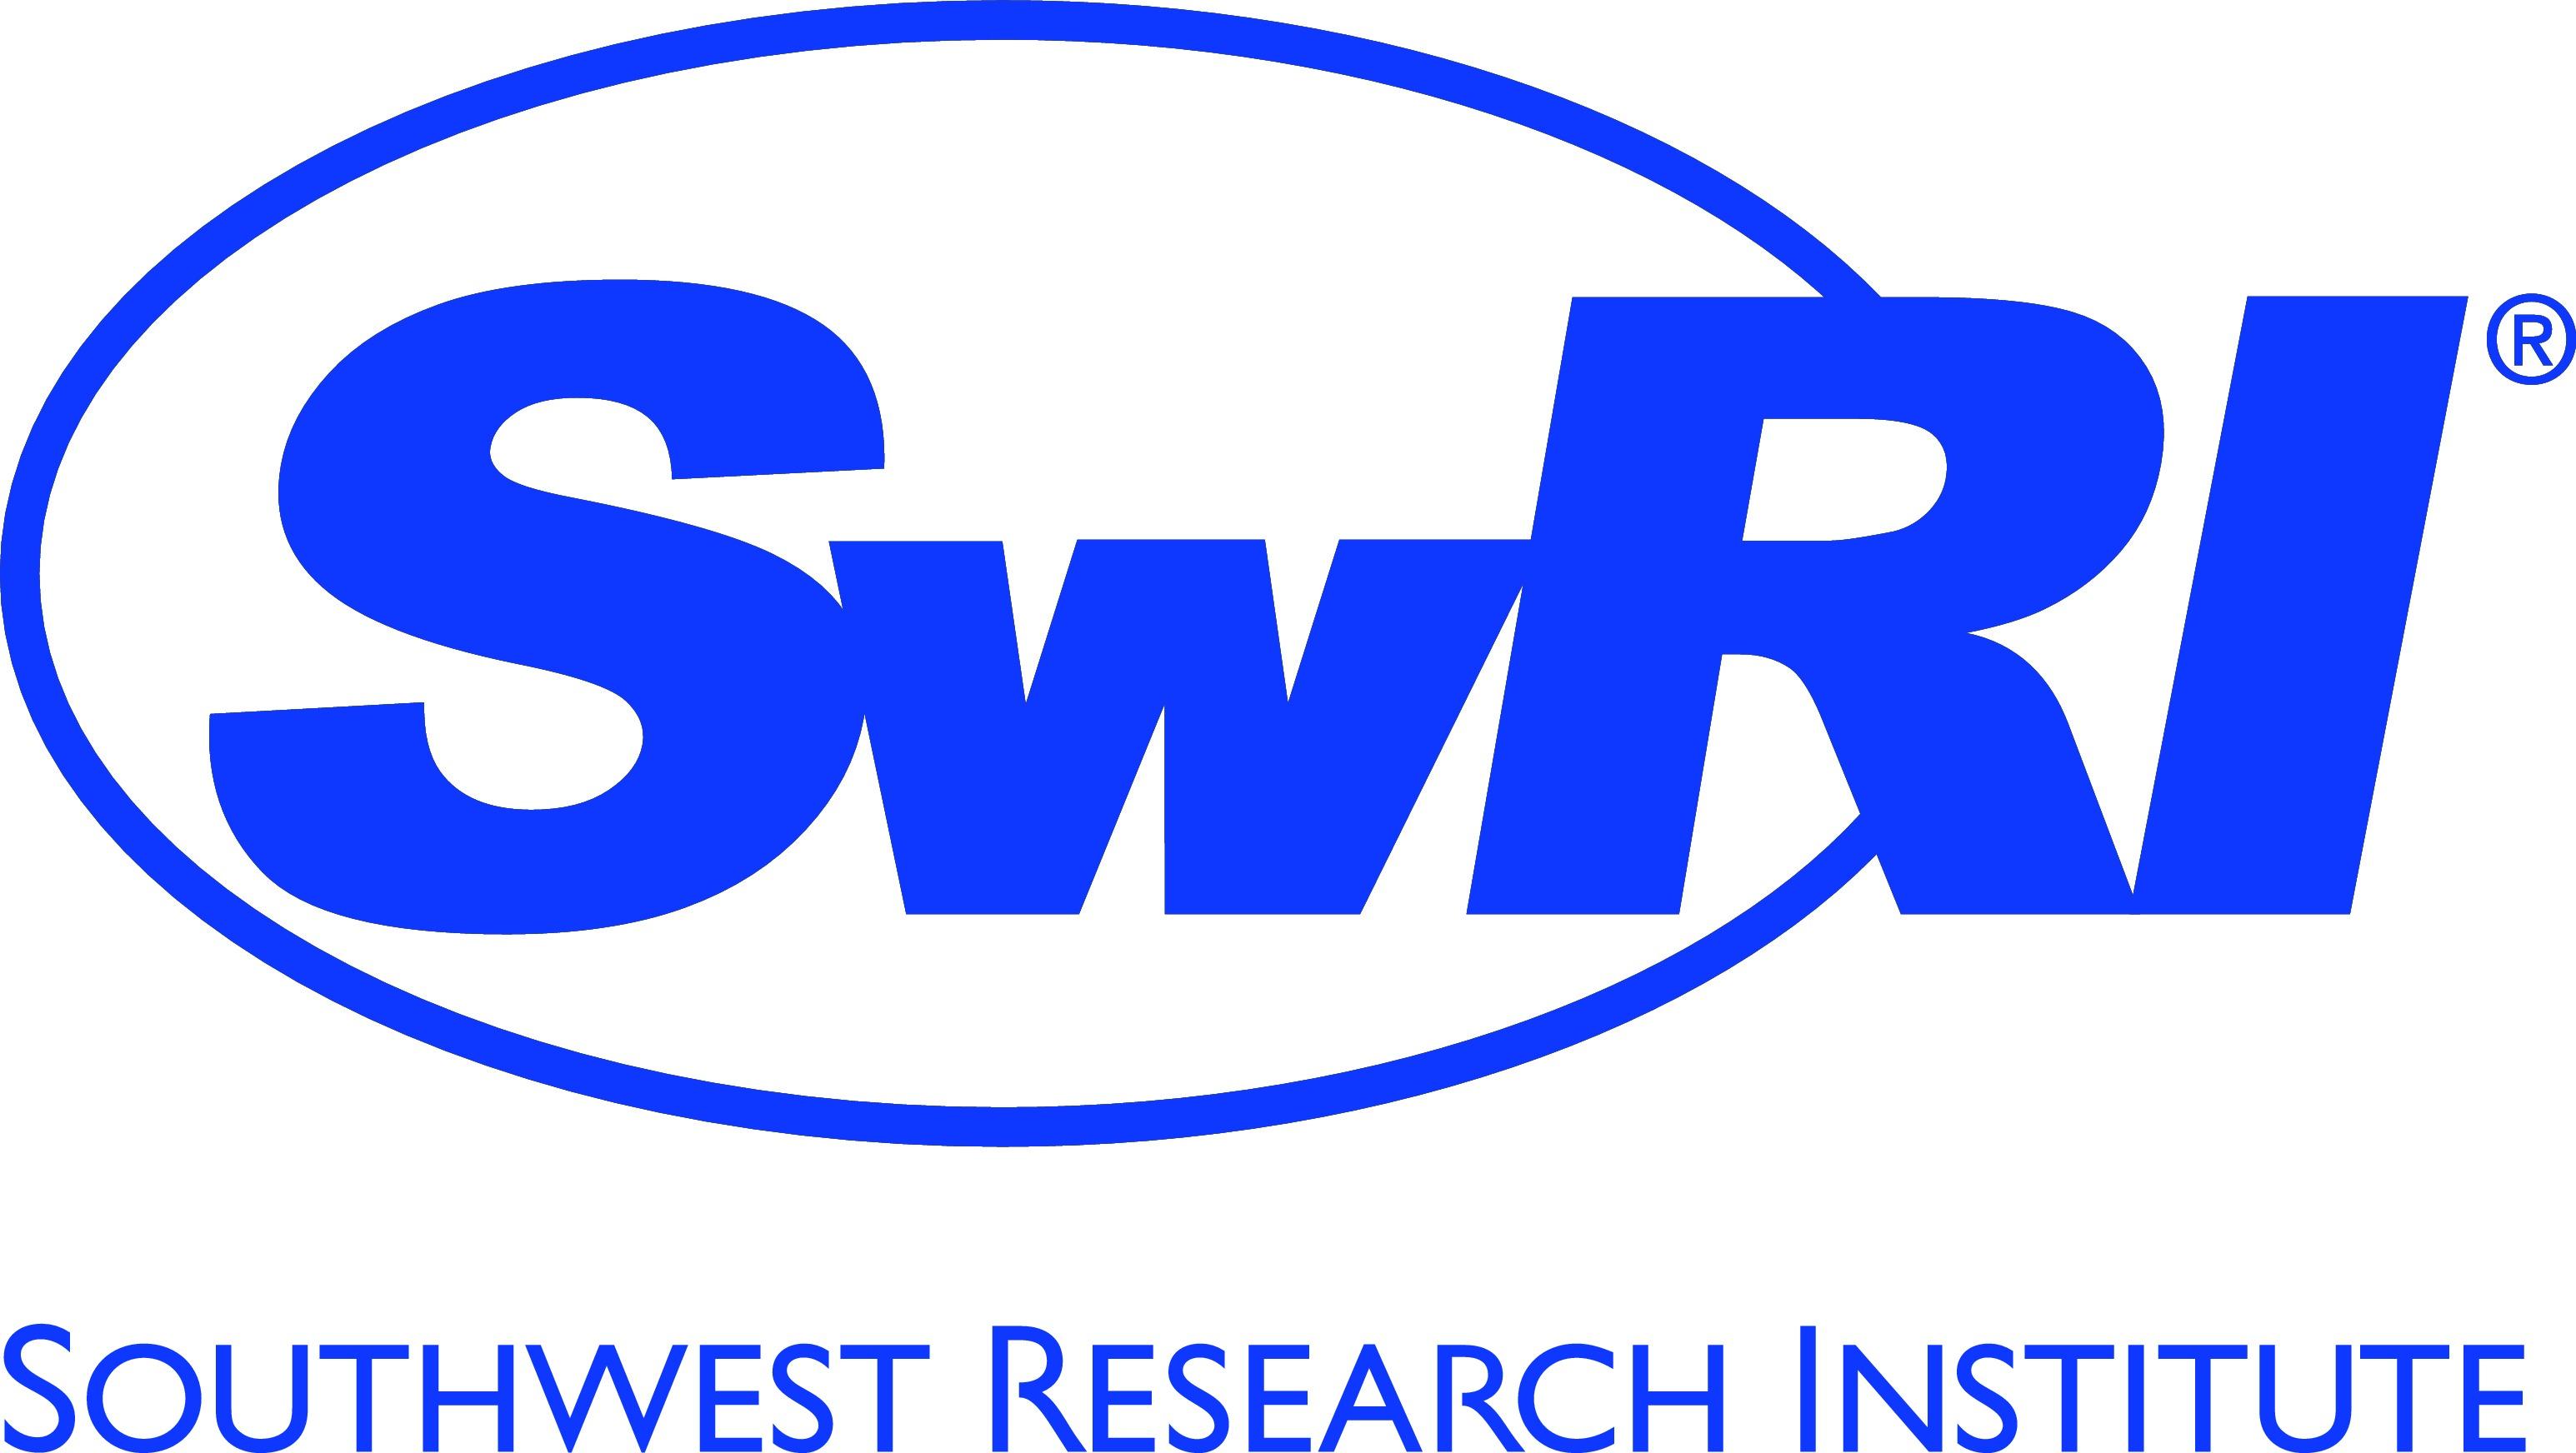 SwRI_Logo_Text_Combo_Vert_2014_Blue_Pantone_2728.p